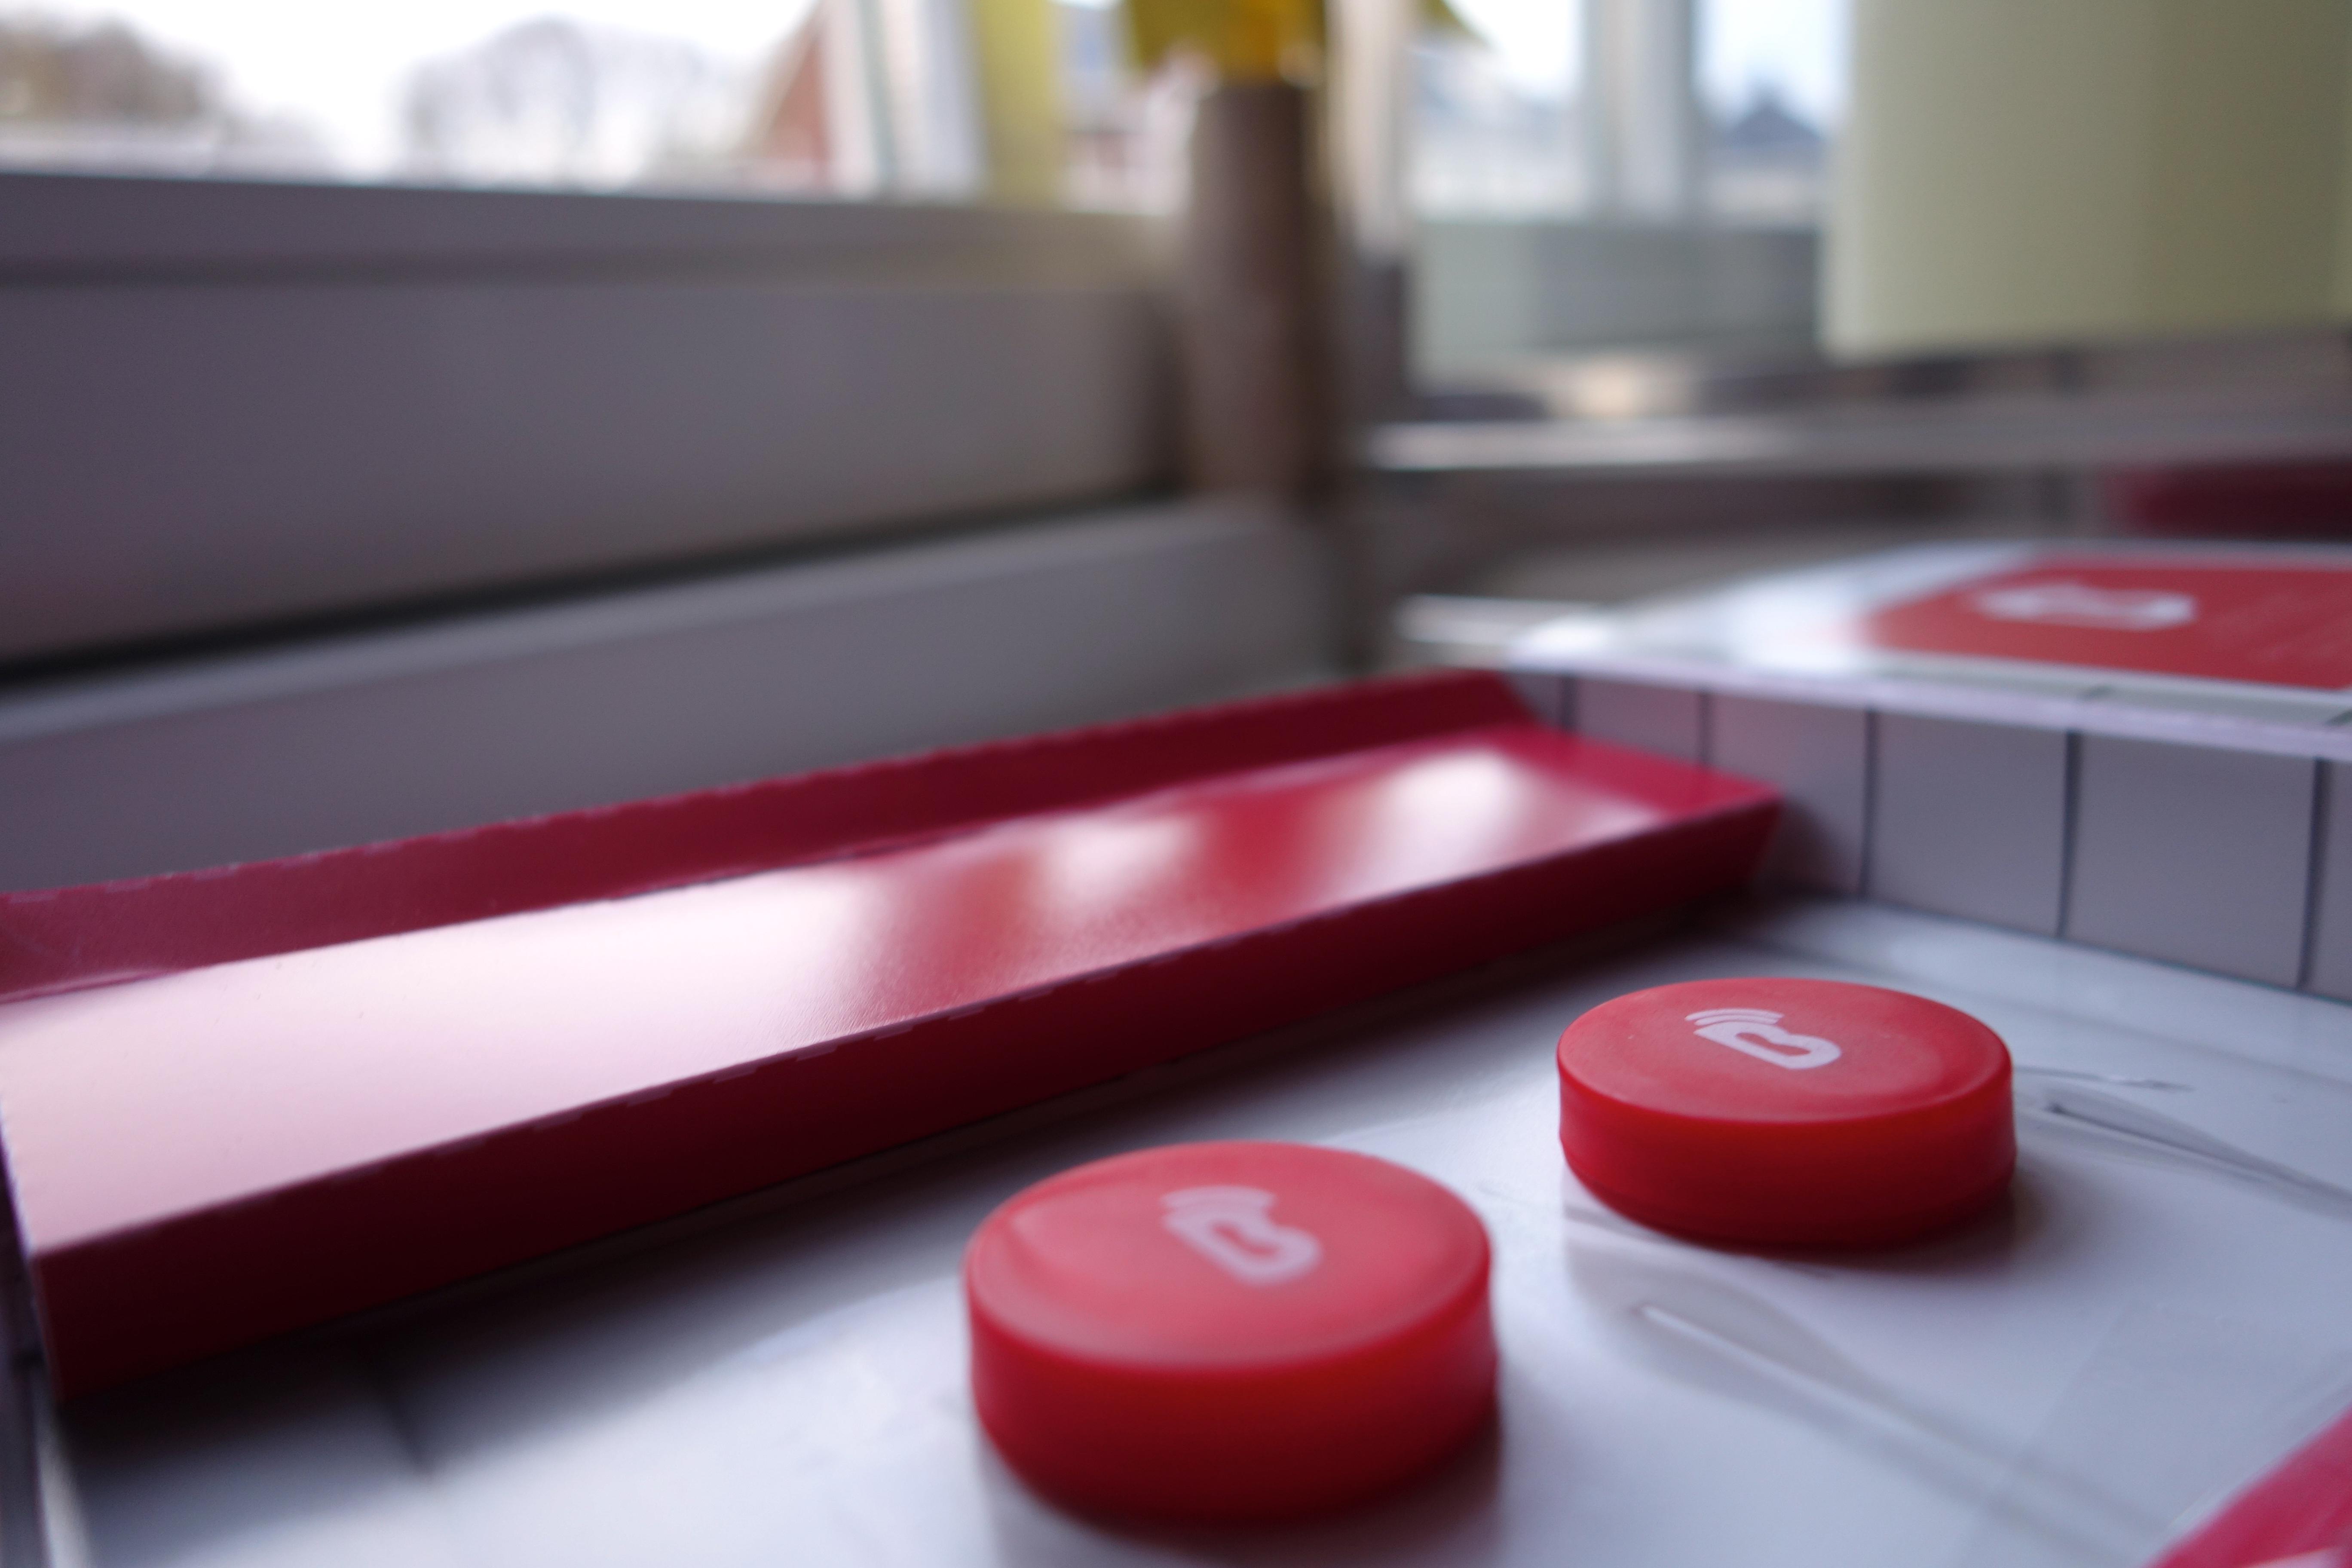 <!--:nl-->Nieuwe batch binnenkort verstuurd..<!--:--><!--:en-->Second batch shipping soon..<!--:-->